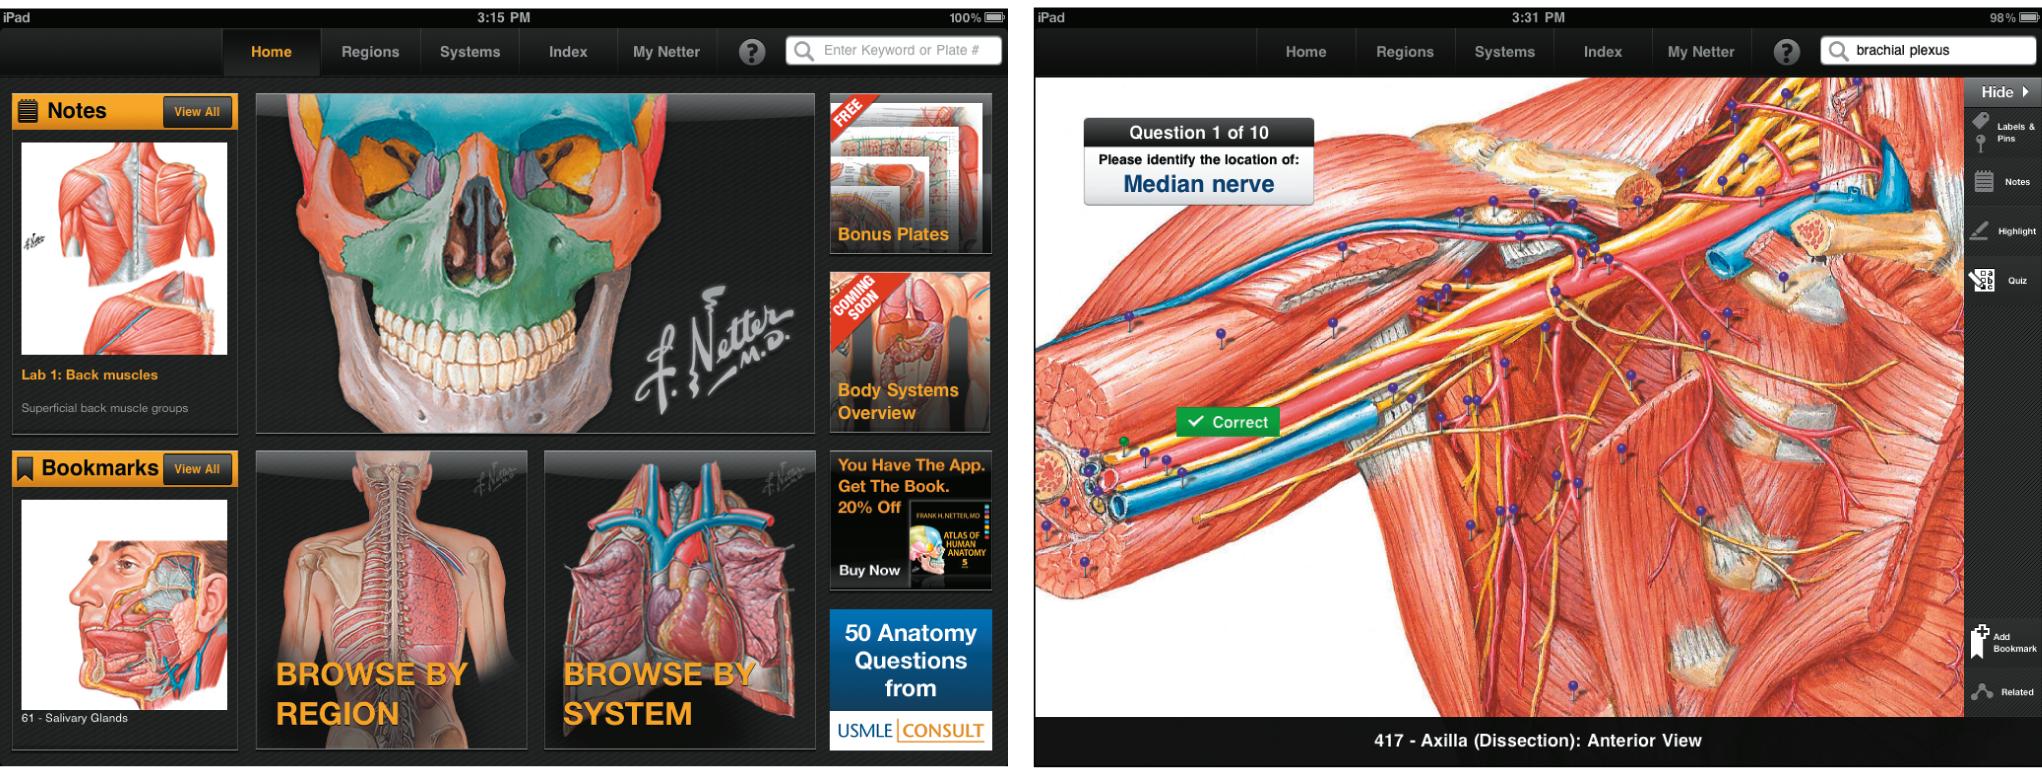 Netters Anatomy Atlas For Ipad Jama Jama Network